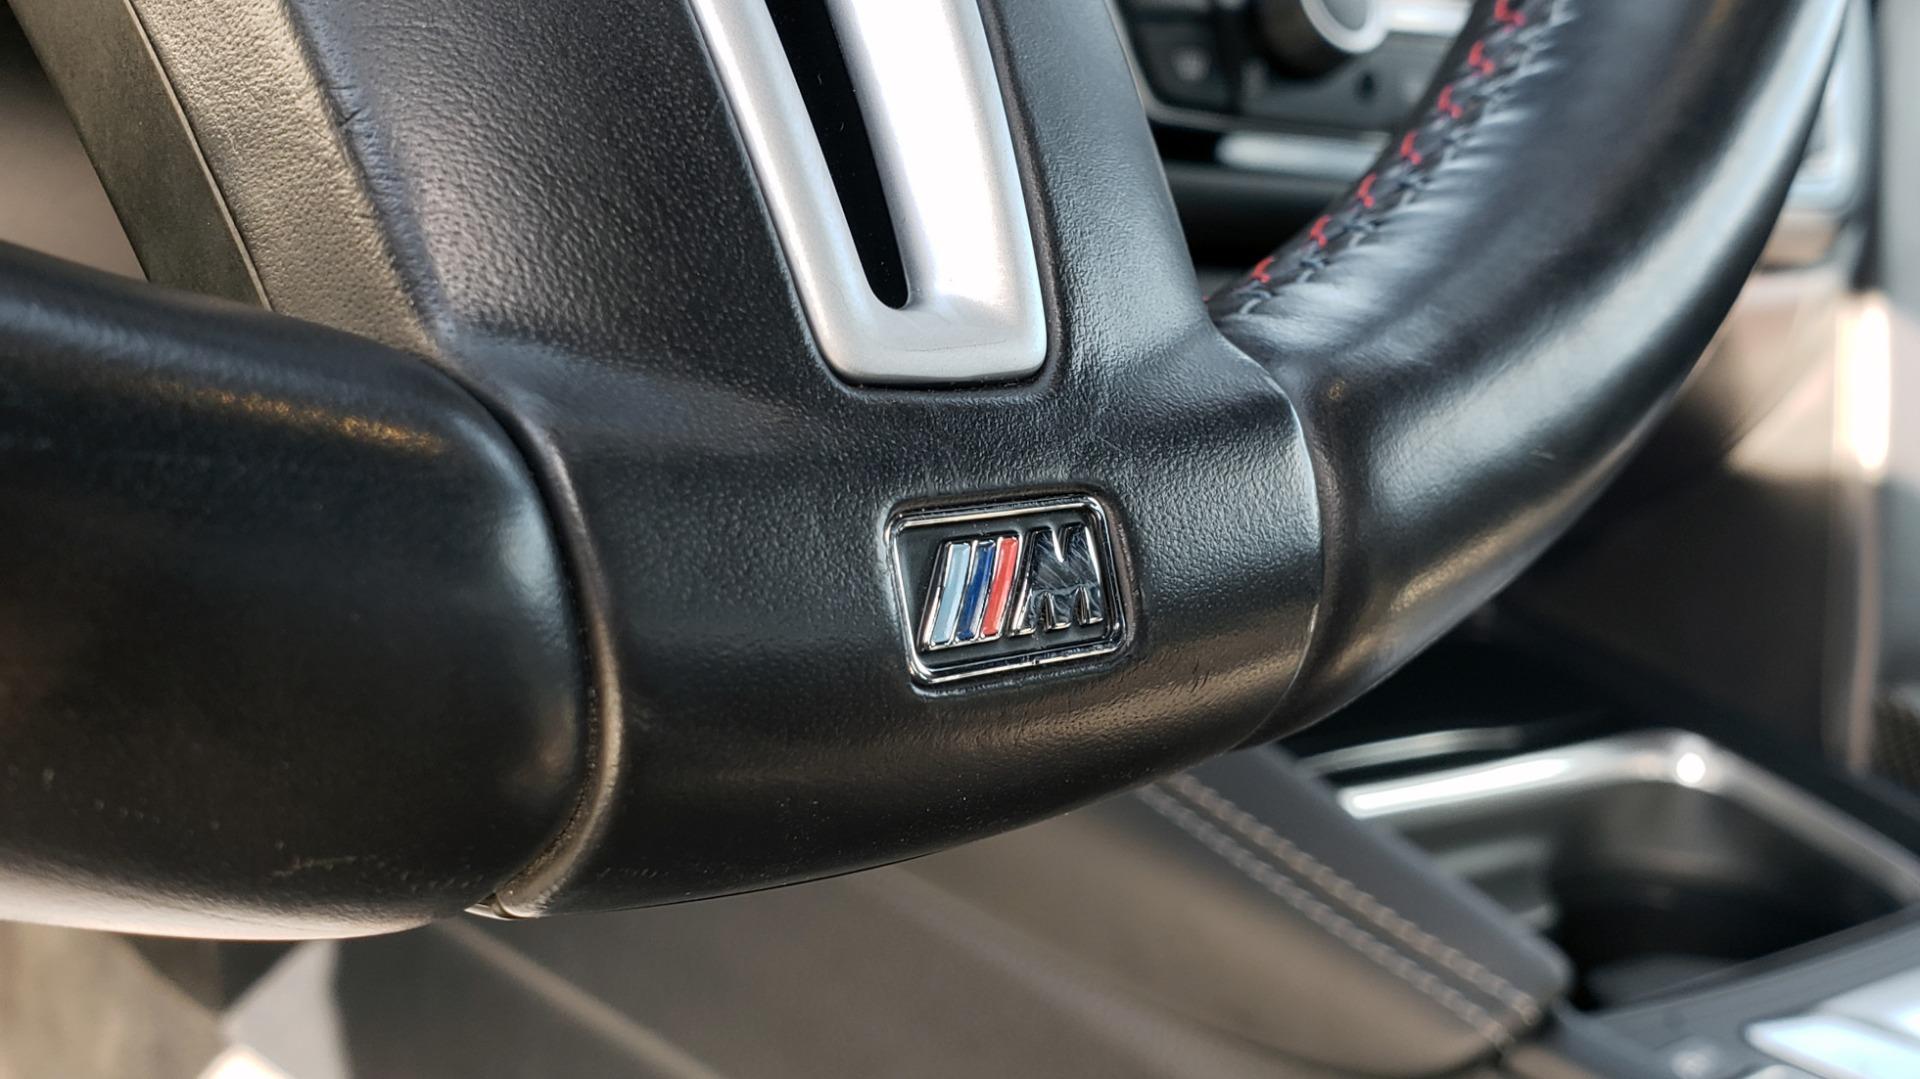 Used 2015 BMW M4 COUPE / EXEC PKG / DRVR ASST PLUS / LIGHTING / M-SUSPENSION for sale Sold at Formula Imports in Charlotte NC 28227 43